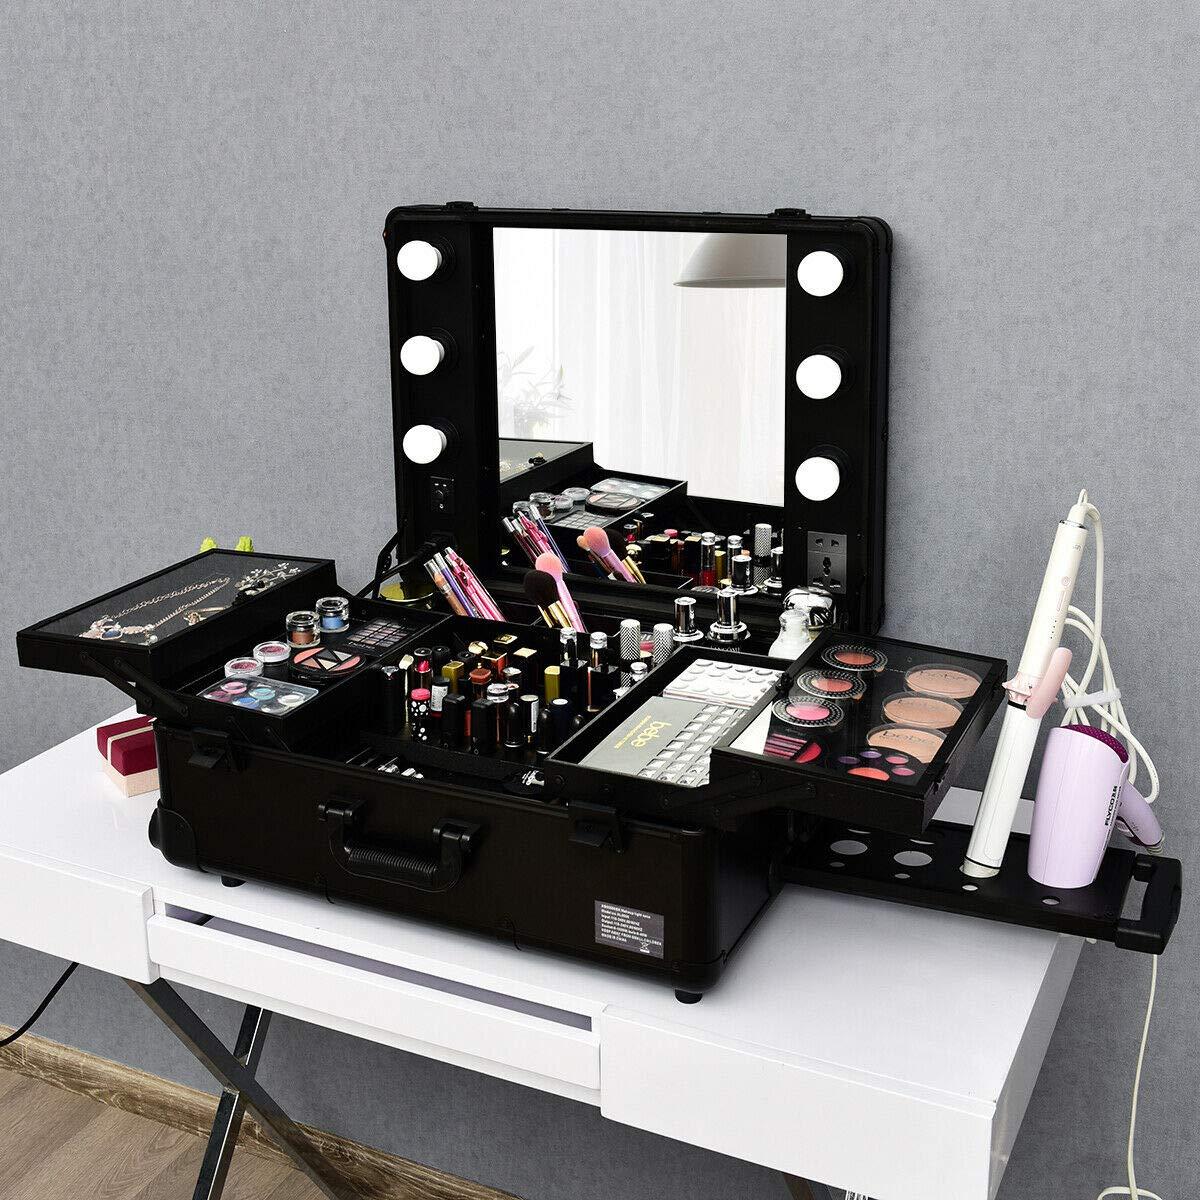 Amazon.com: Estuche de maquillaje portátil enrollable ...